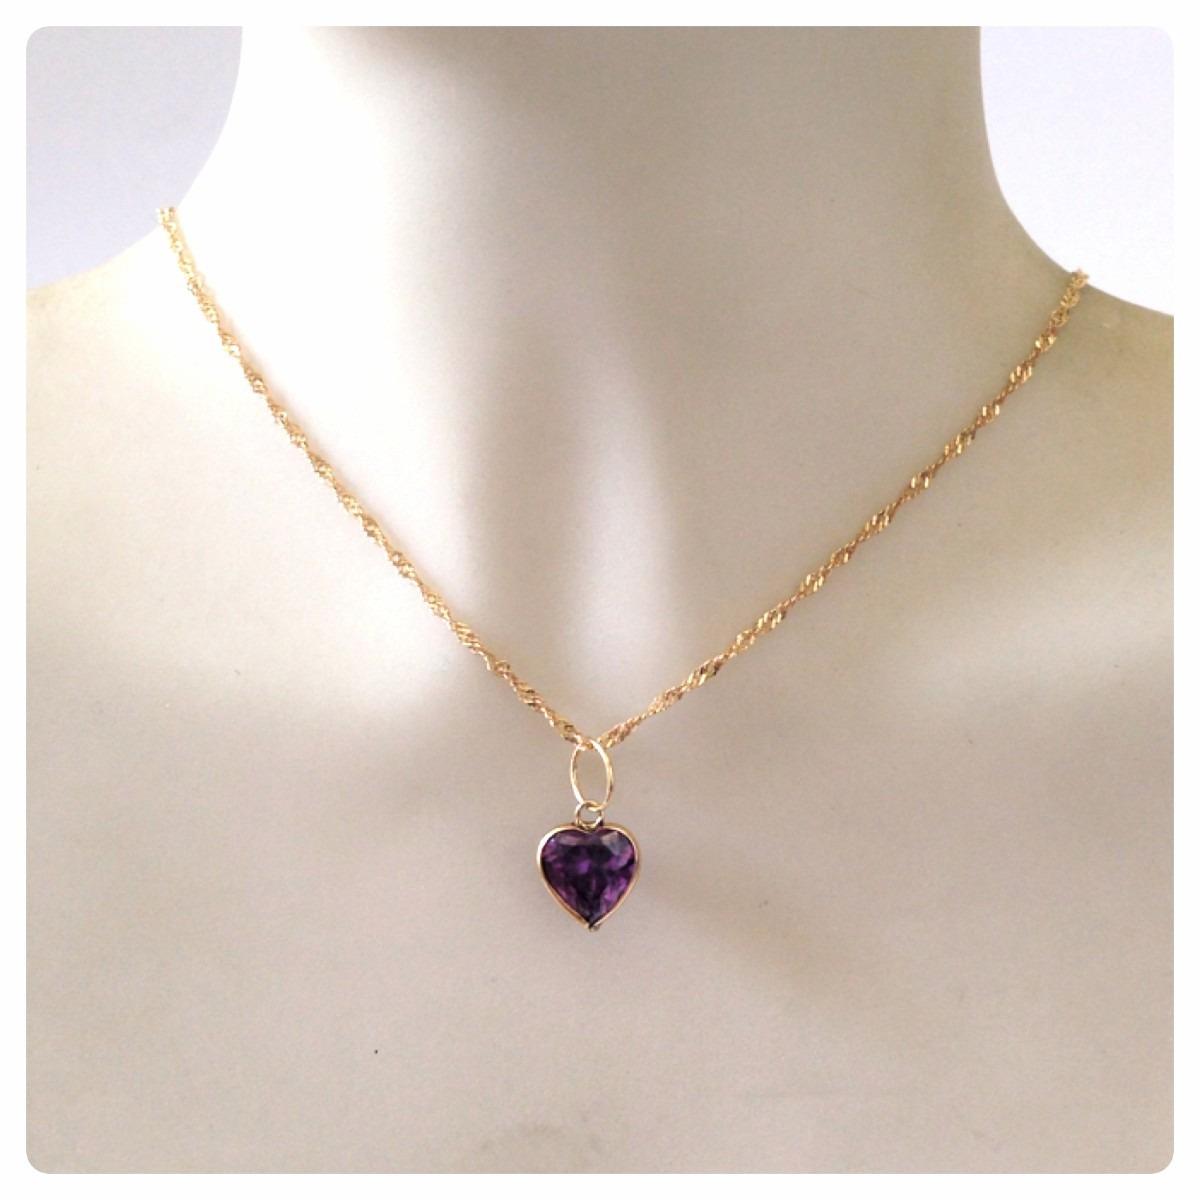 ebec4b9c0c22f gargantilha pingente coração ametista joia ouro 18k certific. Carregando  zoom.